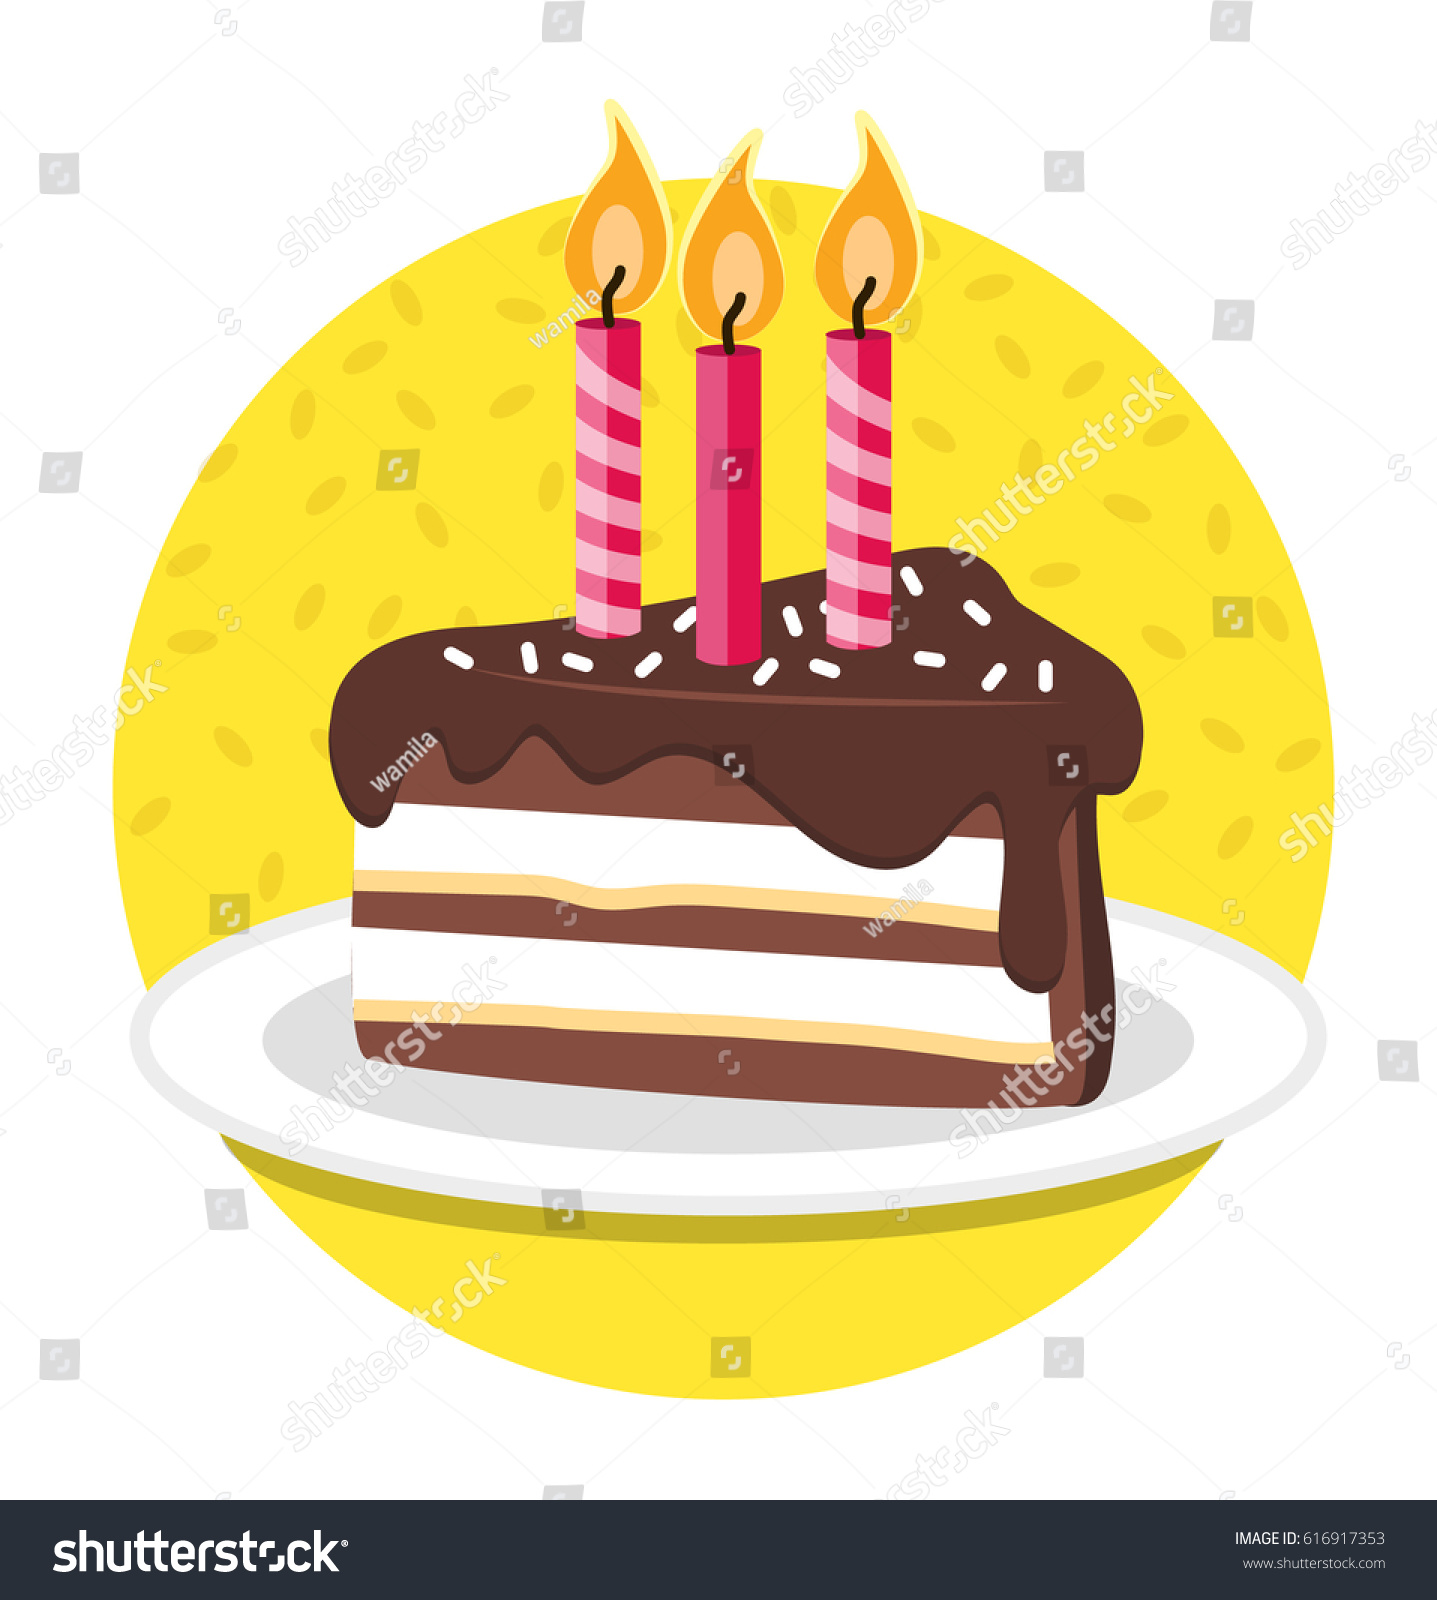 Happy Birthday Slice Birthday Cake Vector Stock Vector Royalty Free